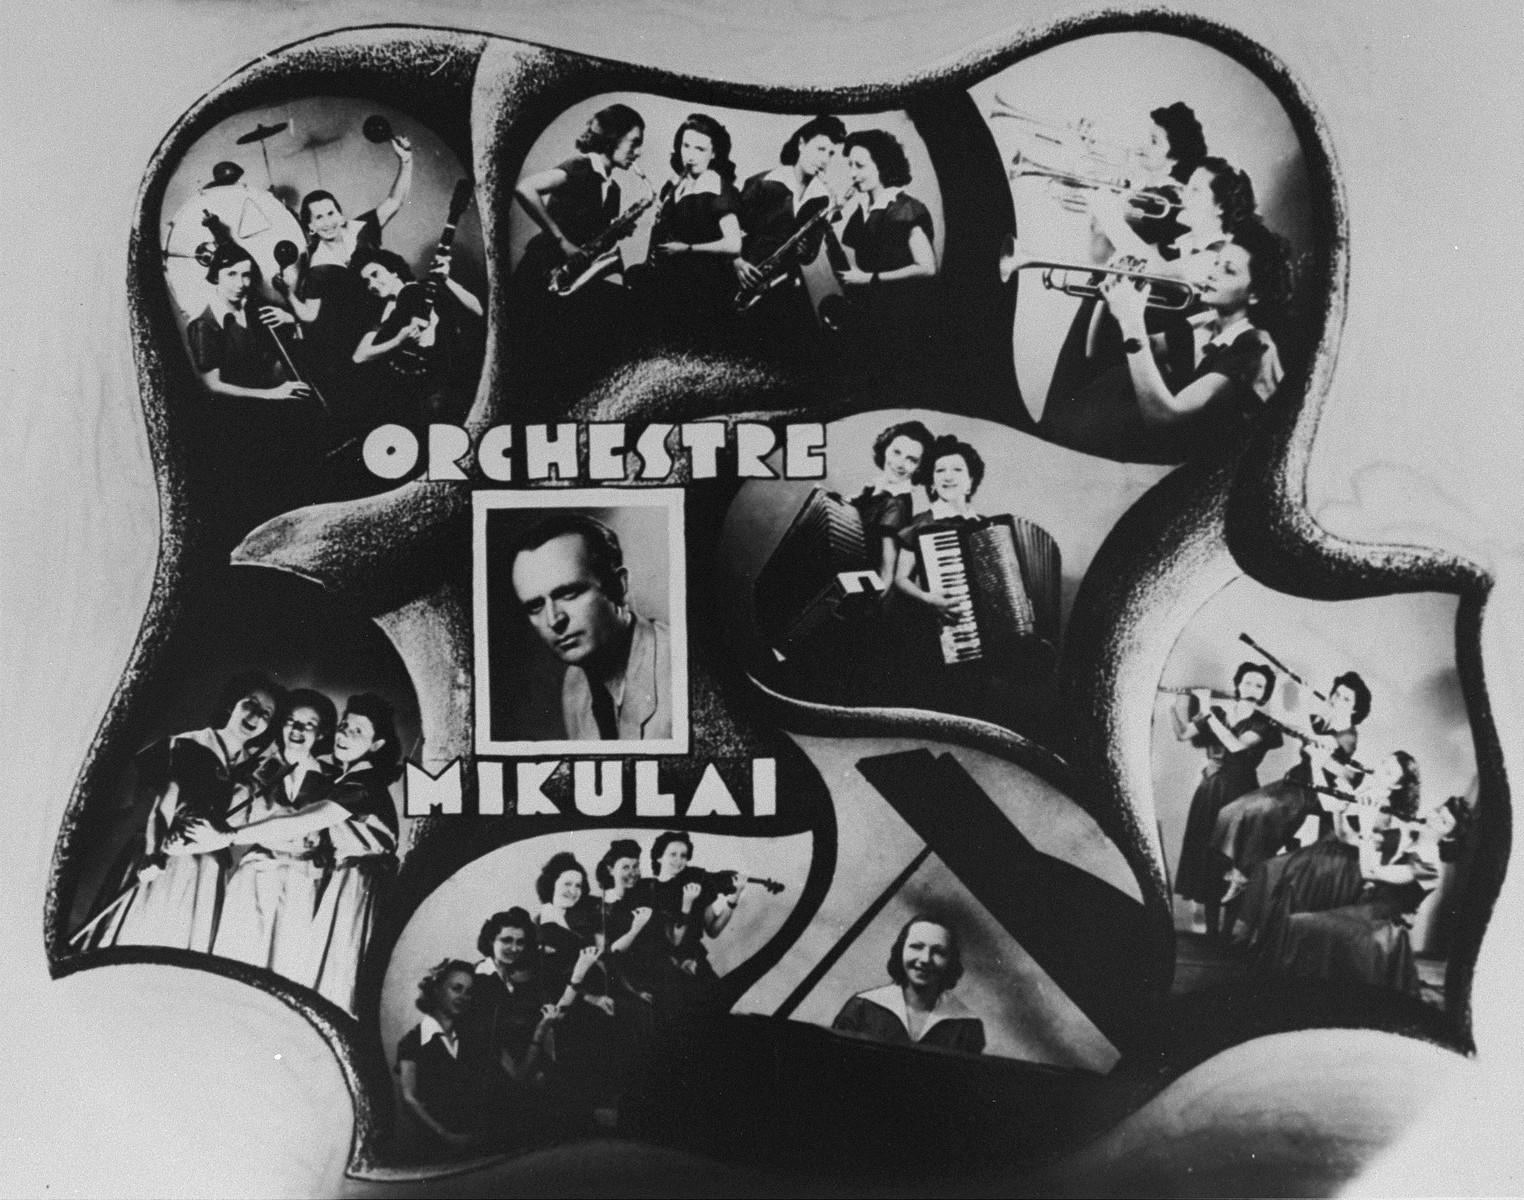 Poster advertising Gustav Mikulai's all-female orchestra.